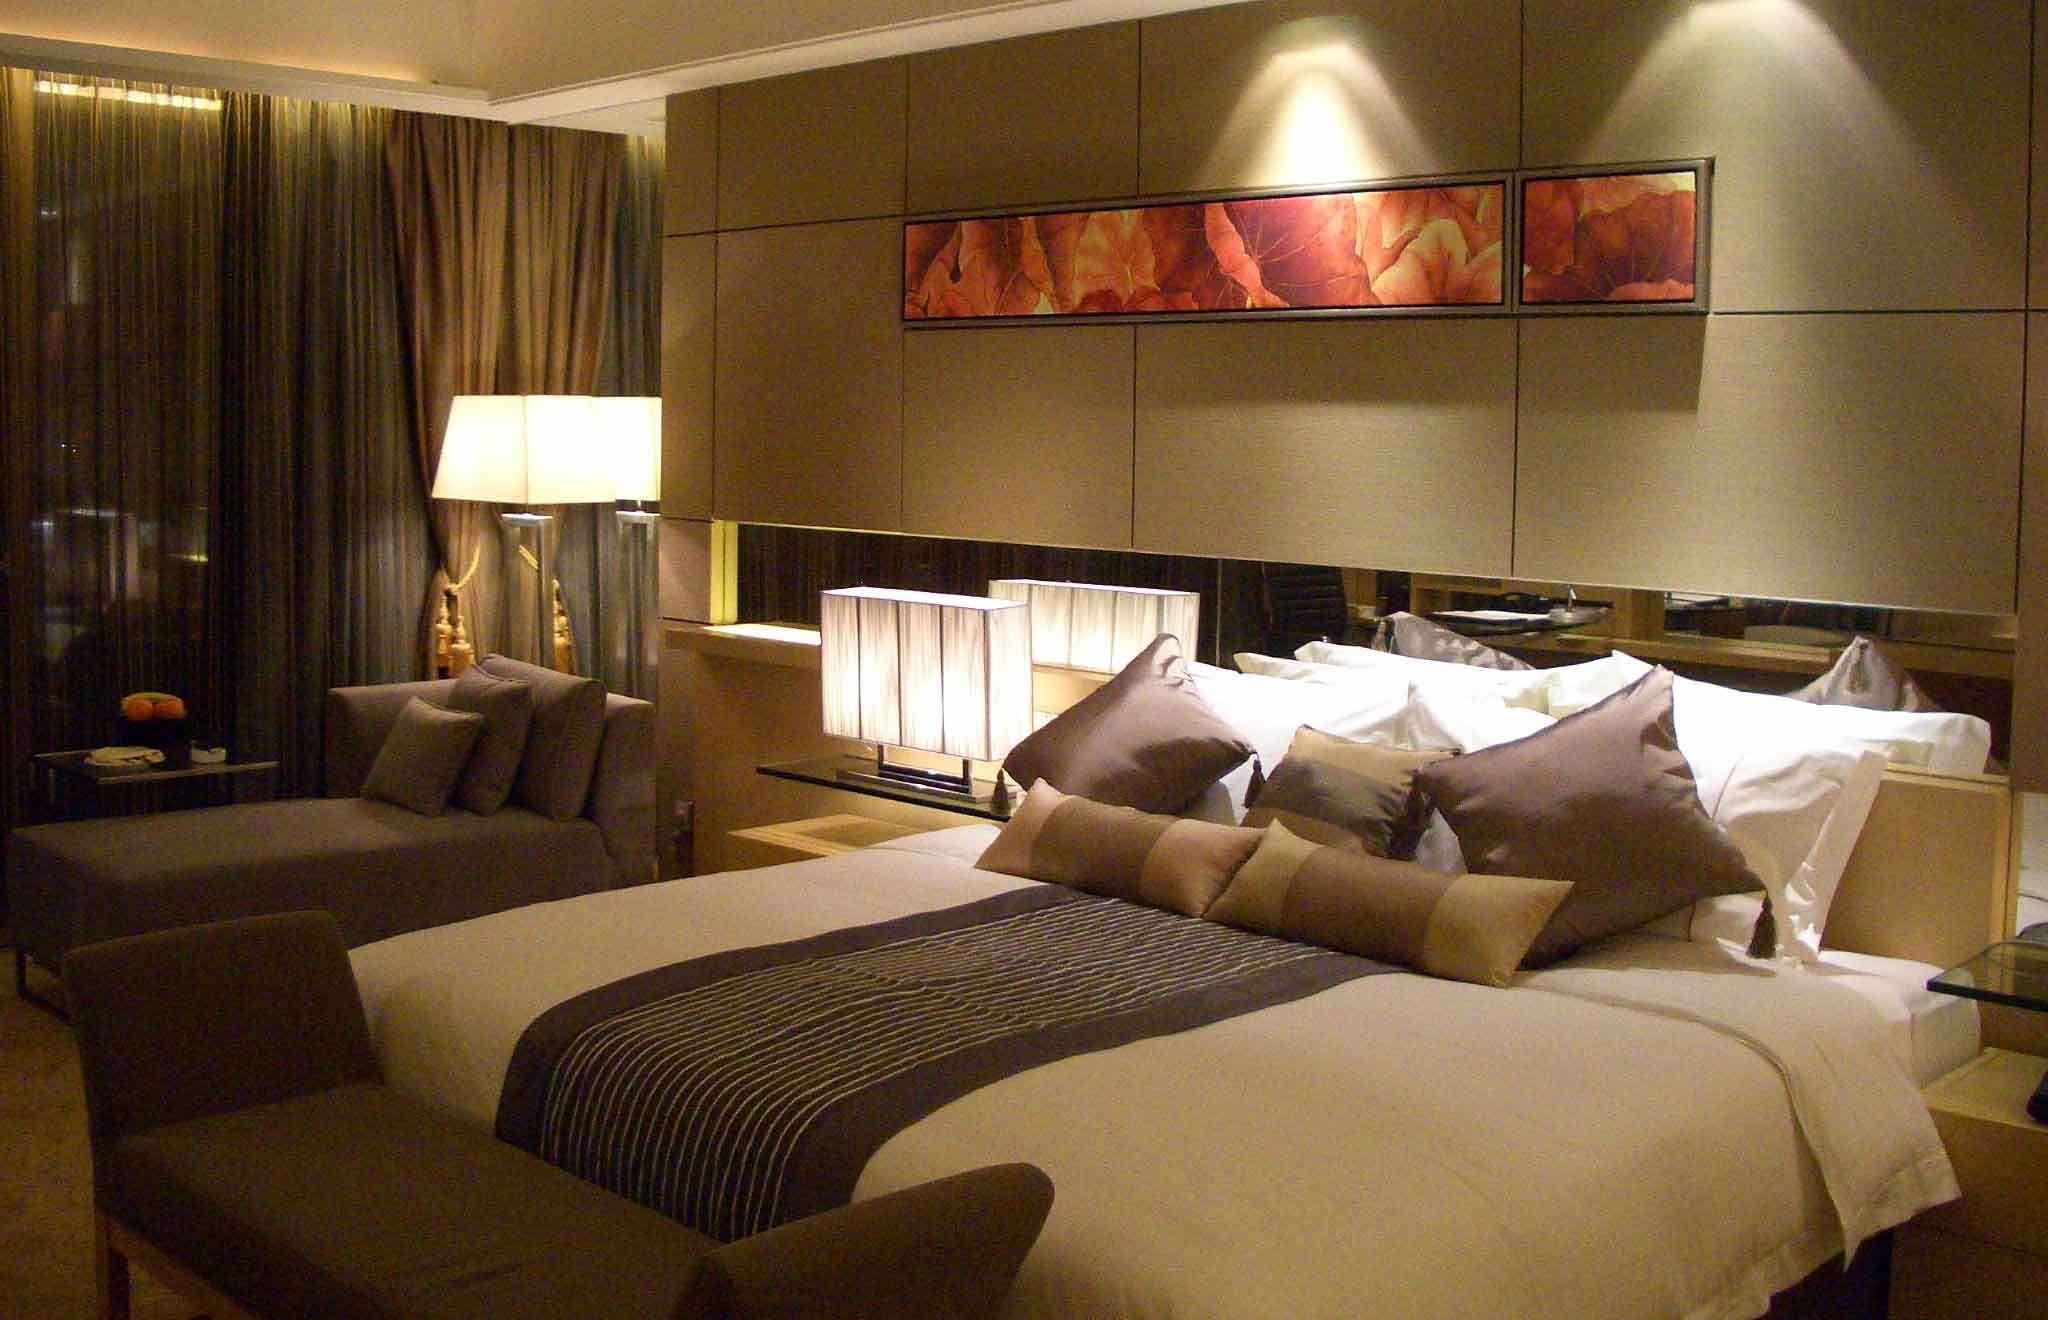 contemporer bedroom ideas large. Modern Contemporary Bedroom Furniture Sets Contemporer Ideas Large